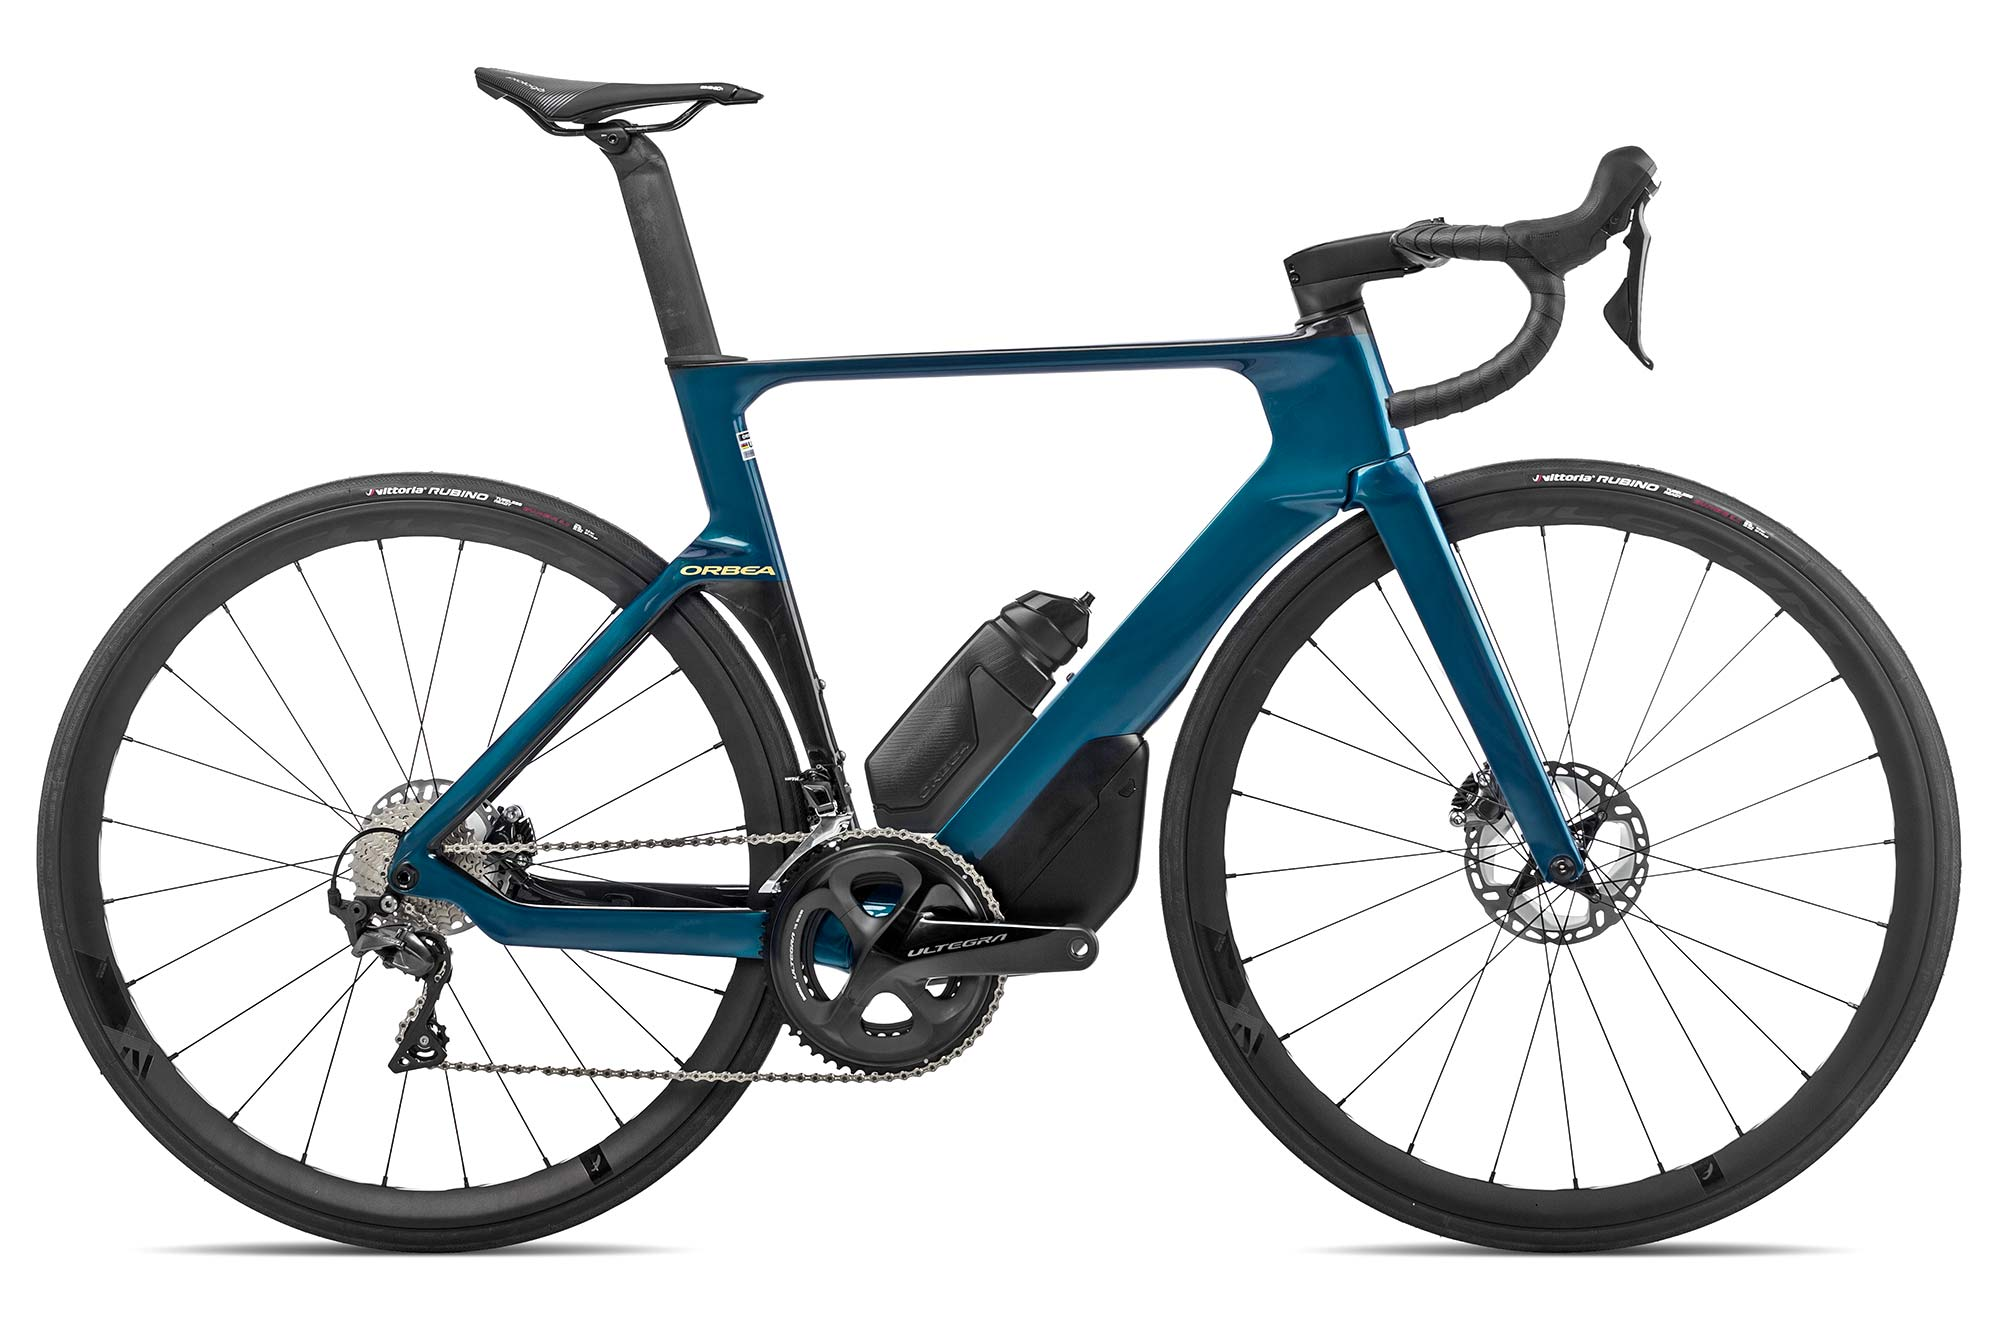 2022 Orbea Orca Aero carbon road bike,